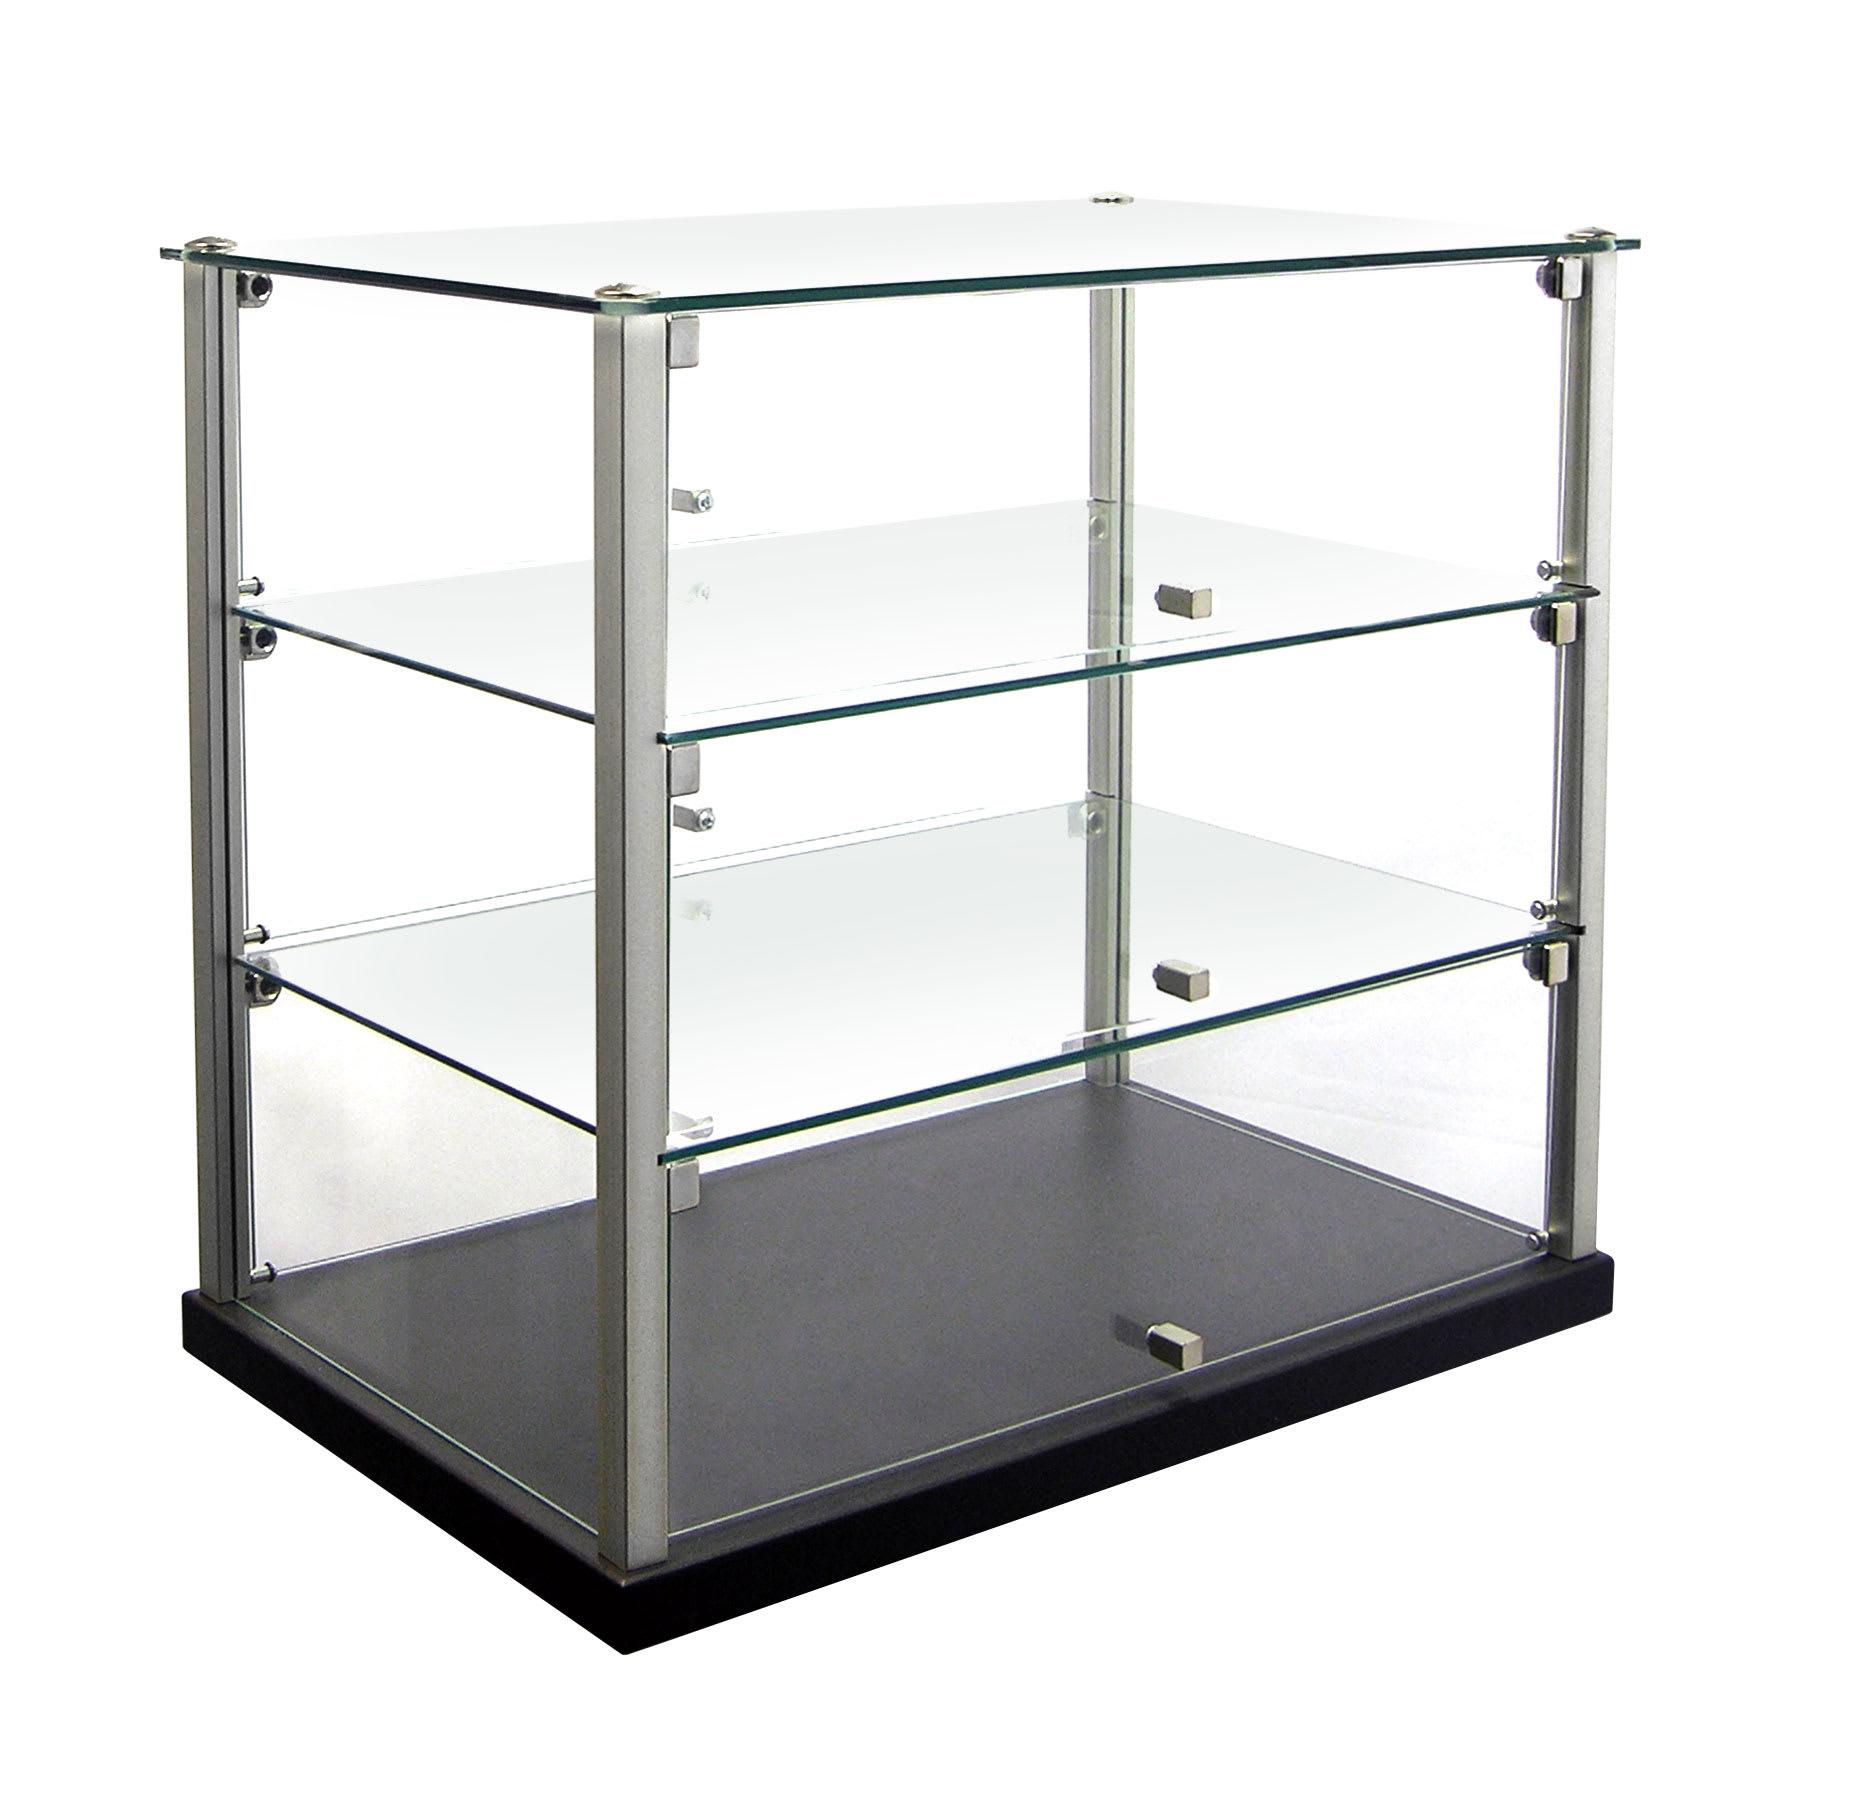 Equipex TN583 3-Tier Enclosed Dual Service Pass-Thru Display w/ (2) Glass Shelves